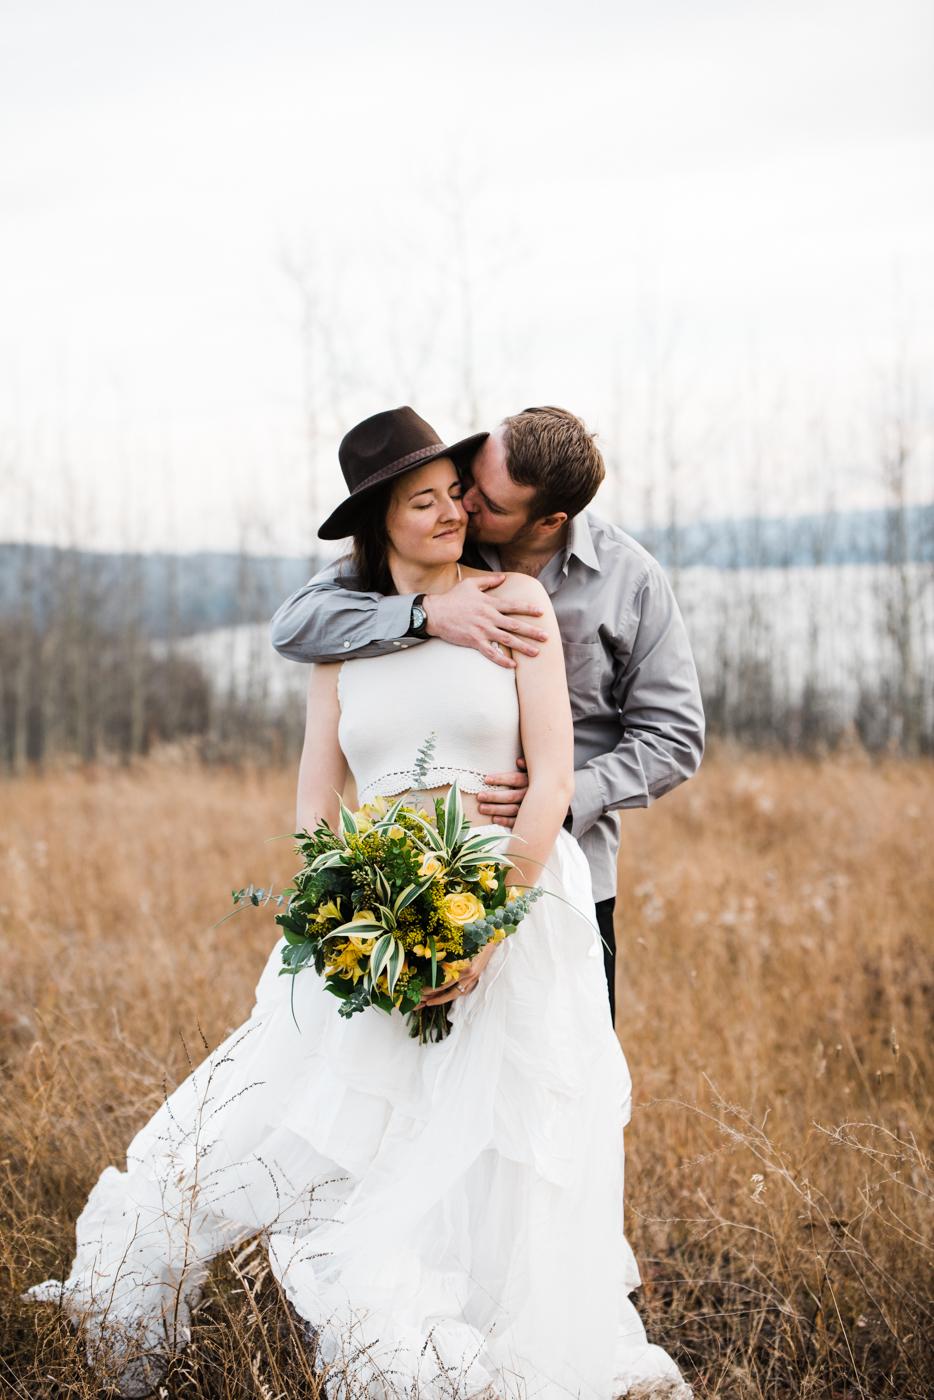 FortSt.John_photographer_TyraEPhotography_Wedding_Couple_Family_Photograhy_DawsonCreek_Elopement_Bride_Boduoir_Portraits-31.jpg